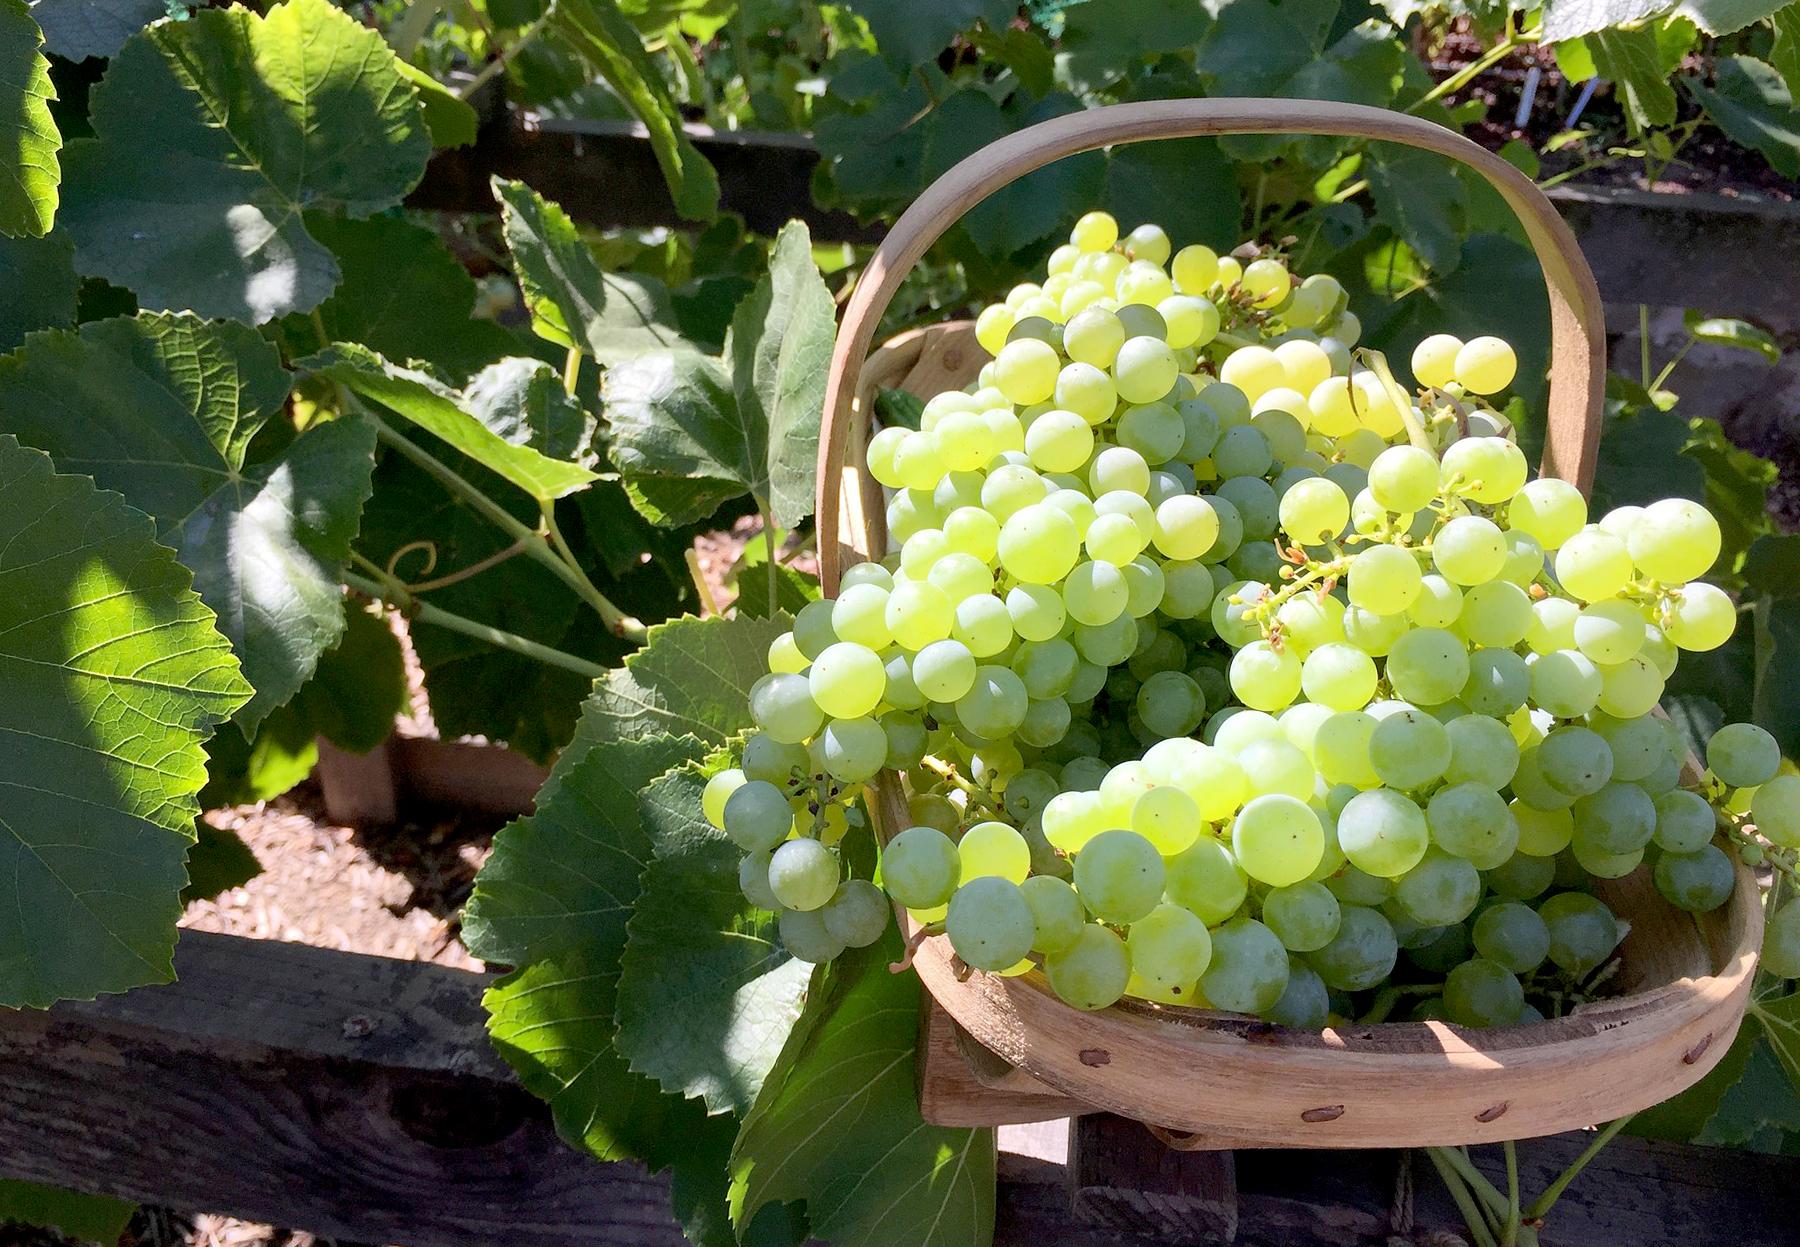 http://mariniranje.rs/wp-content/uploads/2020/04/Mariniranje-4-my-garden-by-Mike-Kiley-on-Pixabay.jpg